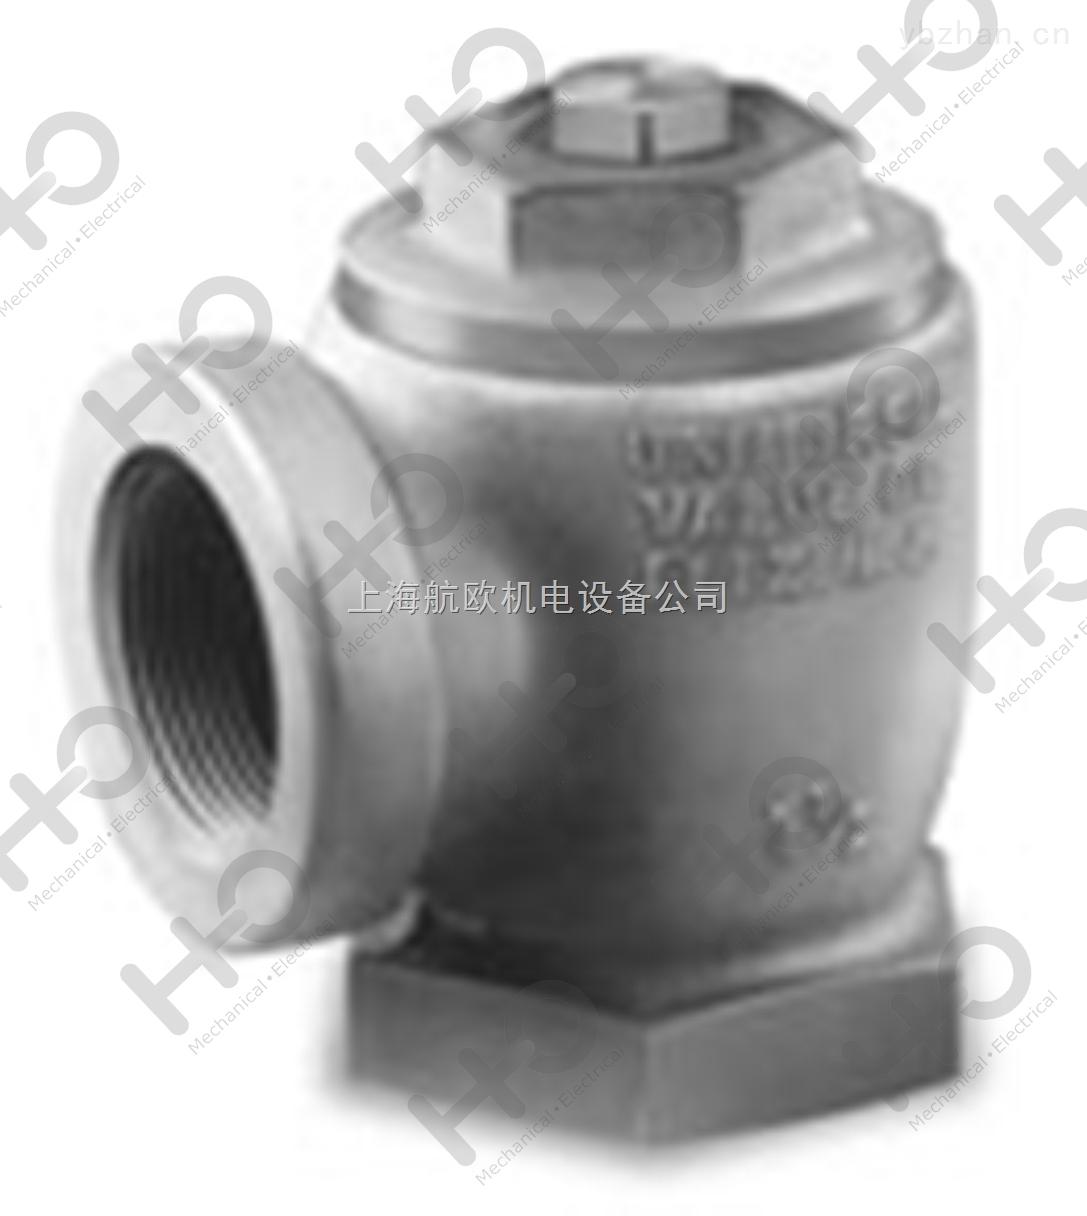 E-BN-05P2E-elodrive产品 24 V AC/DCE-BN-05P2E